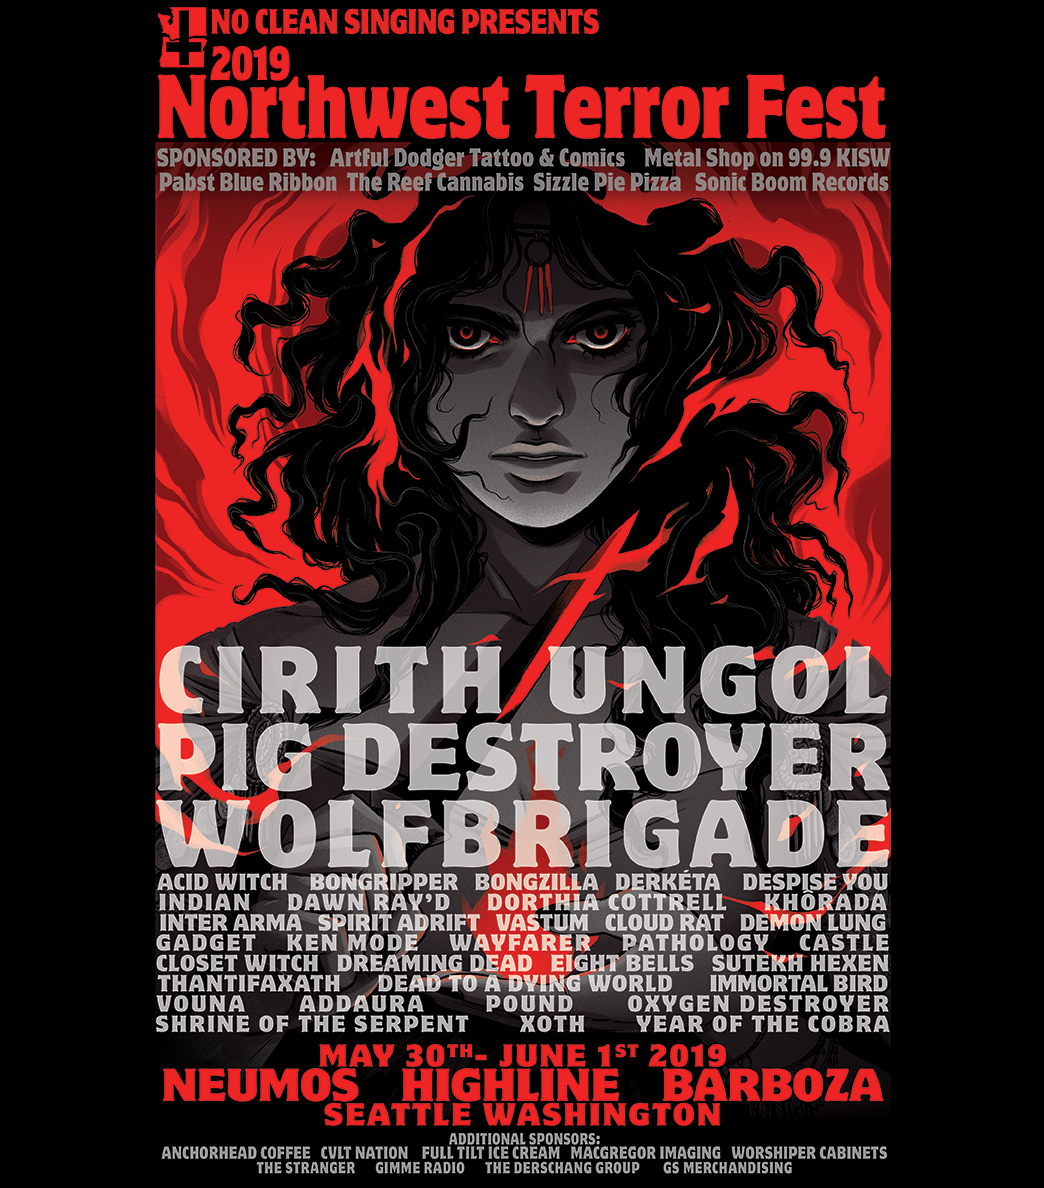 Northwest Terror Fest Poster 2019